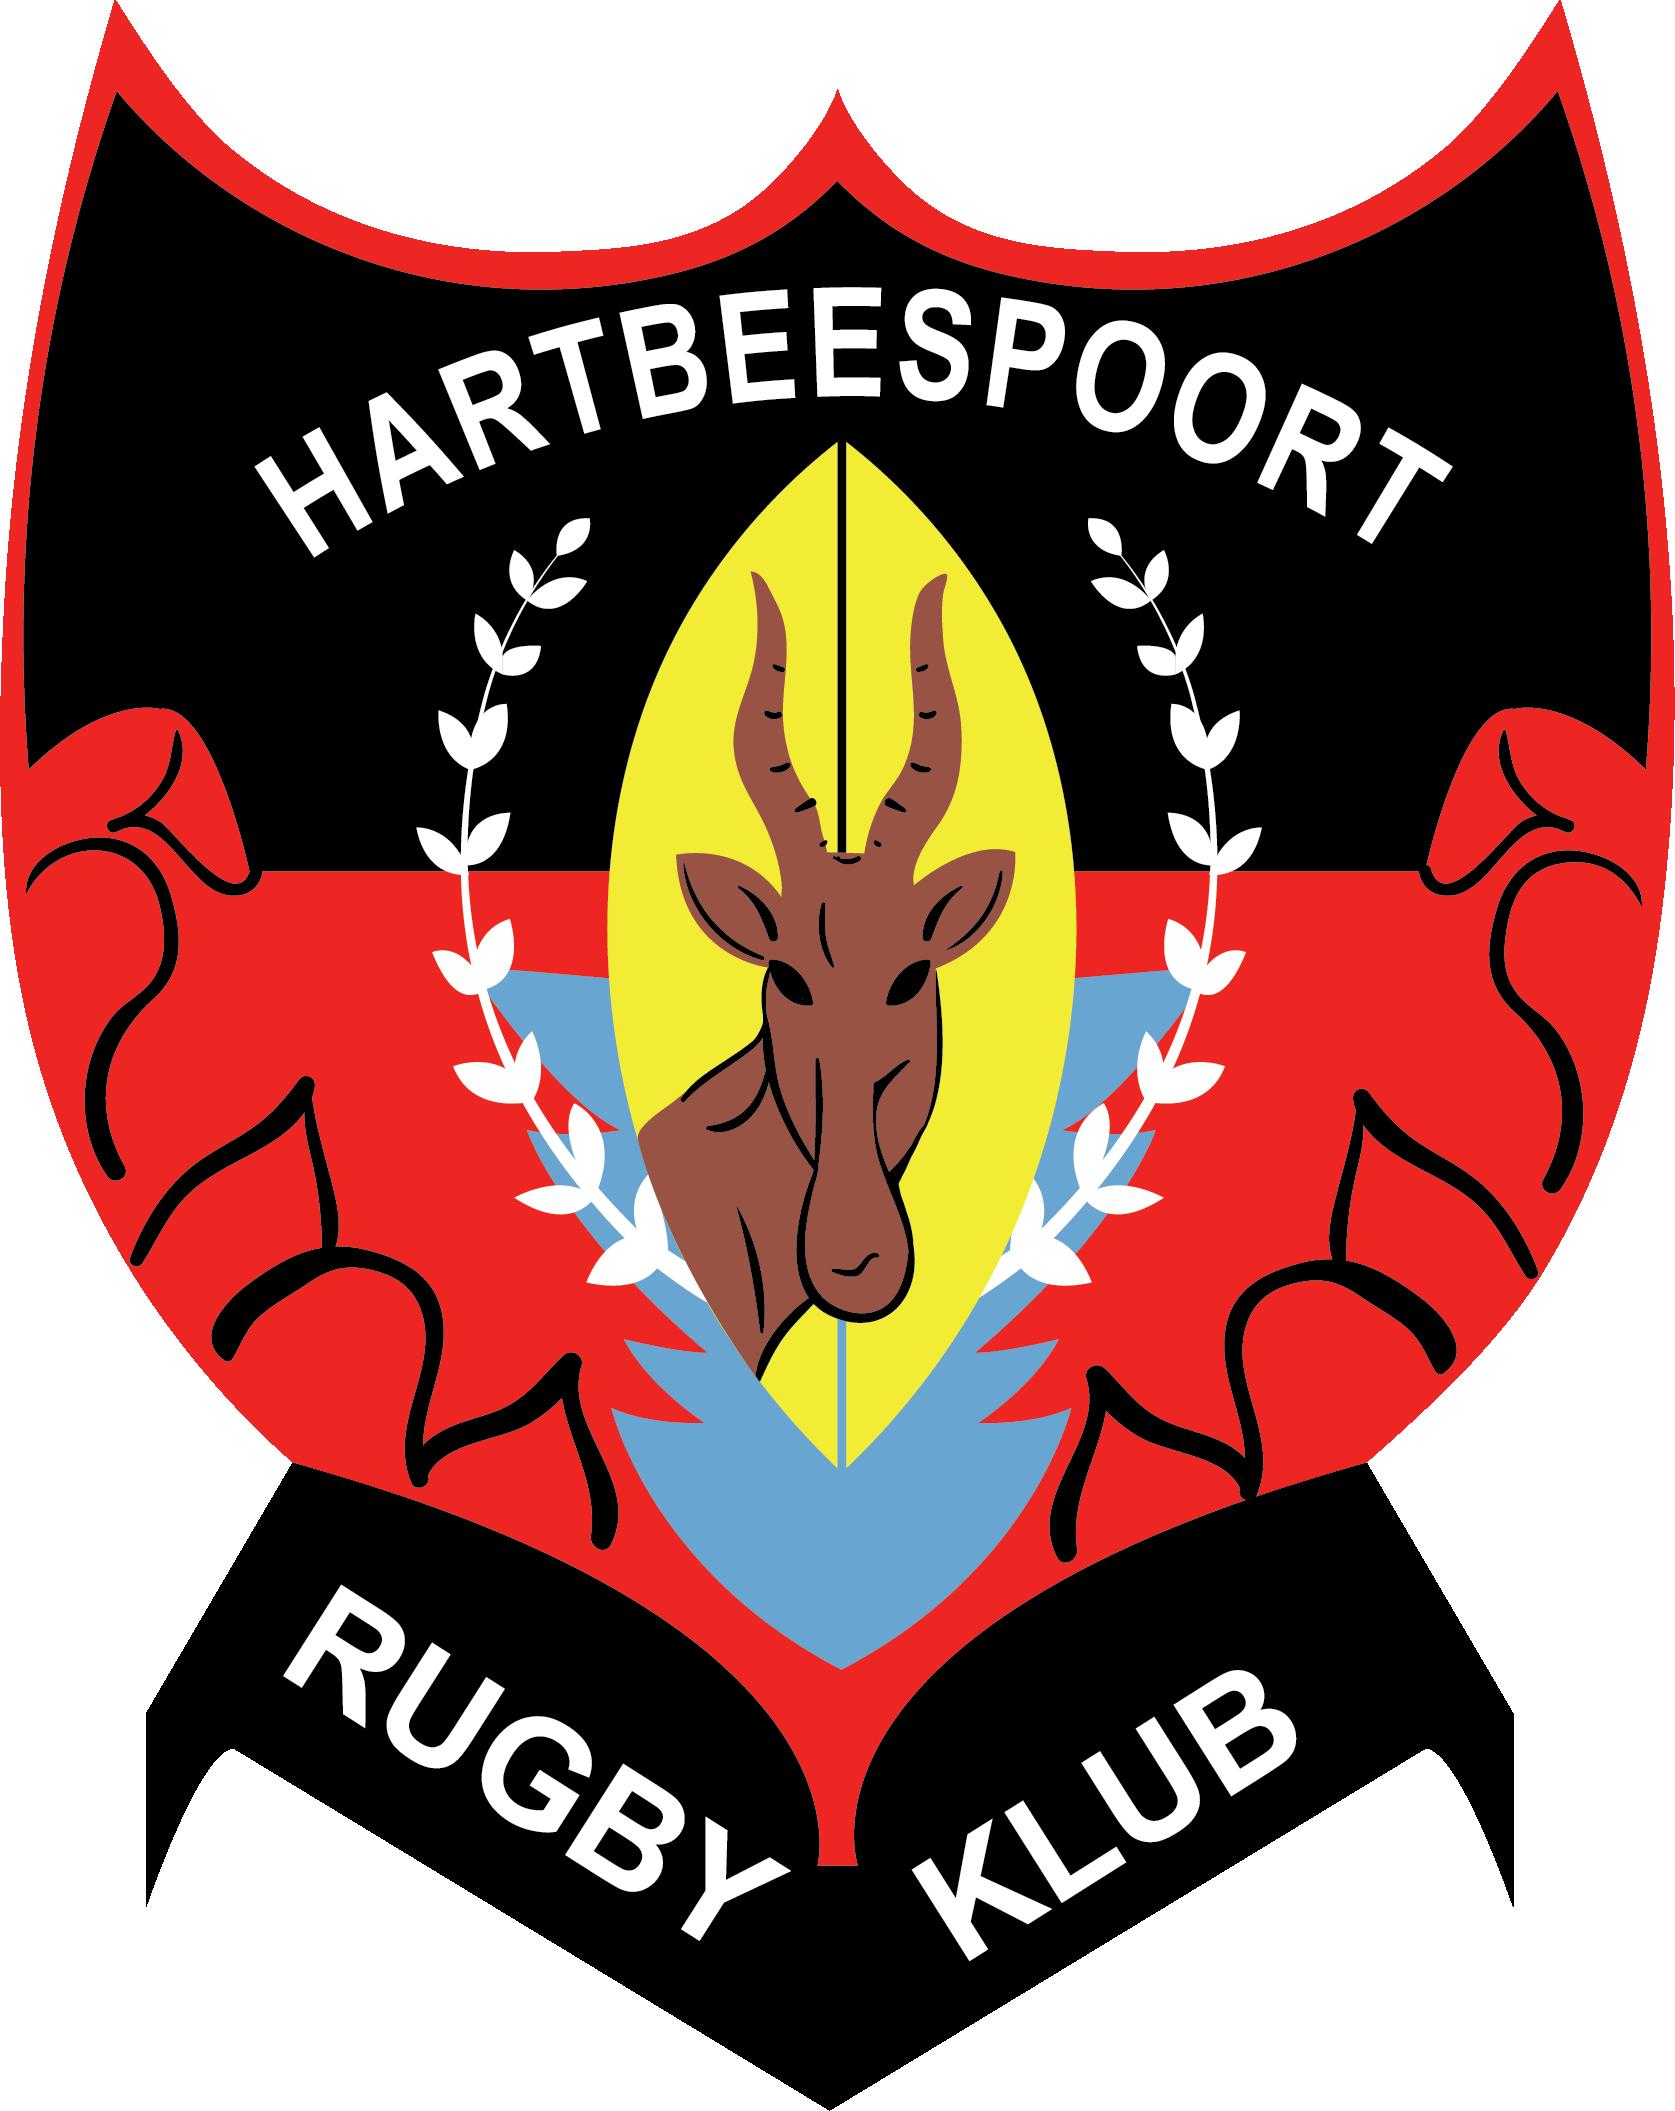 Hartbeespoort Rugby Club